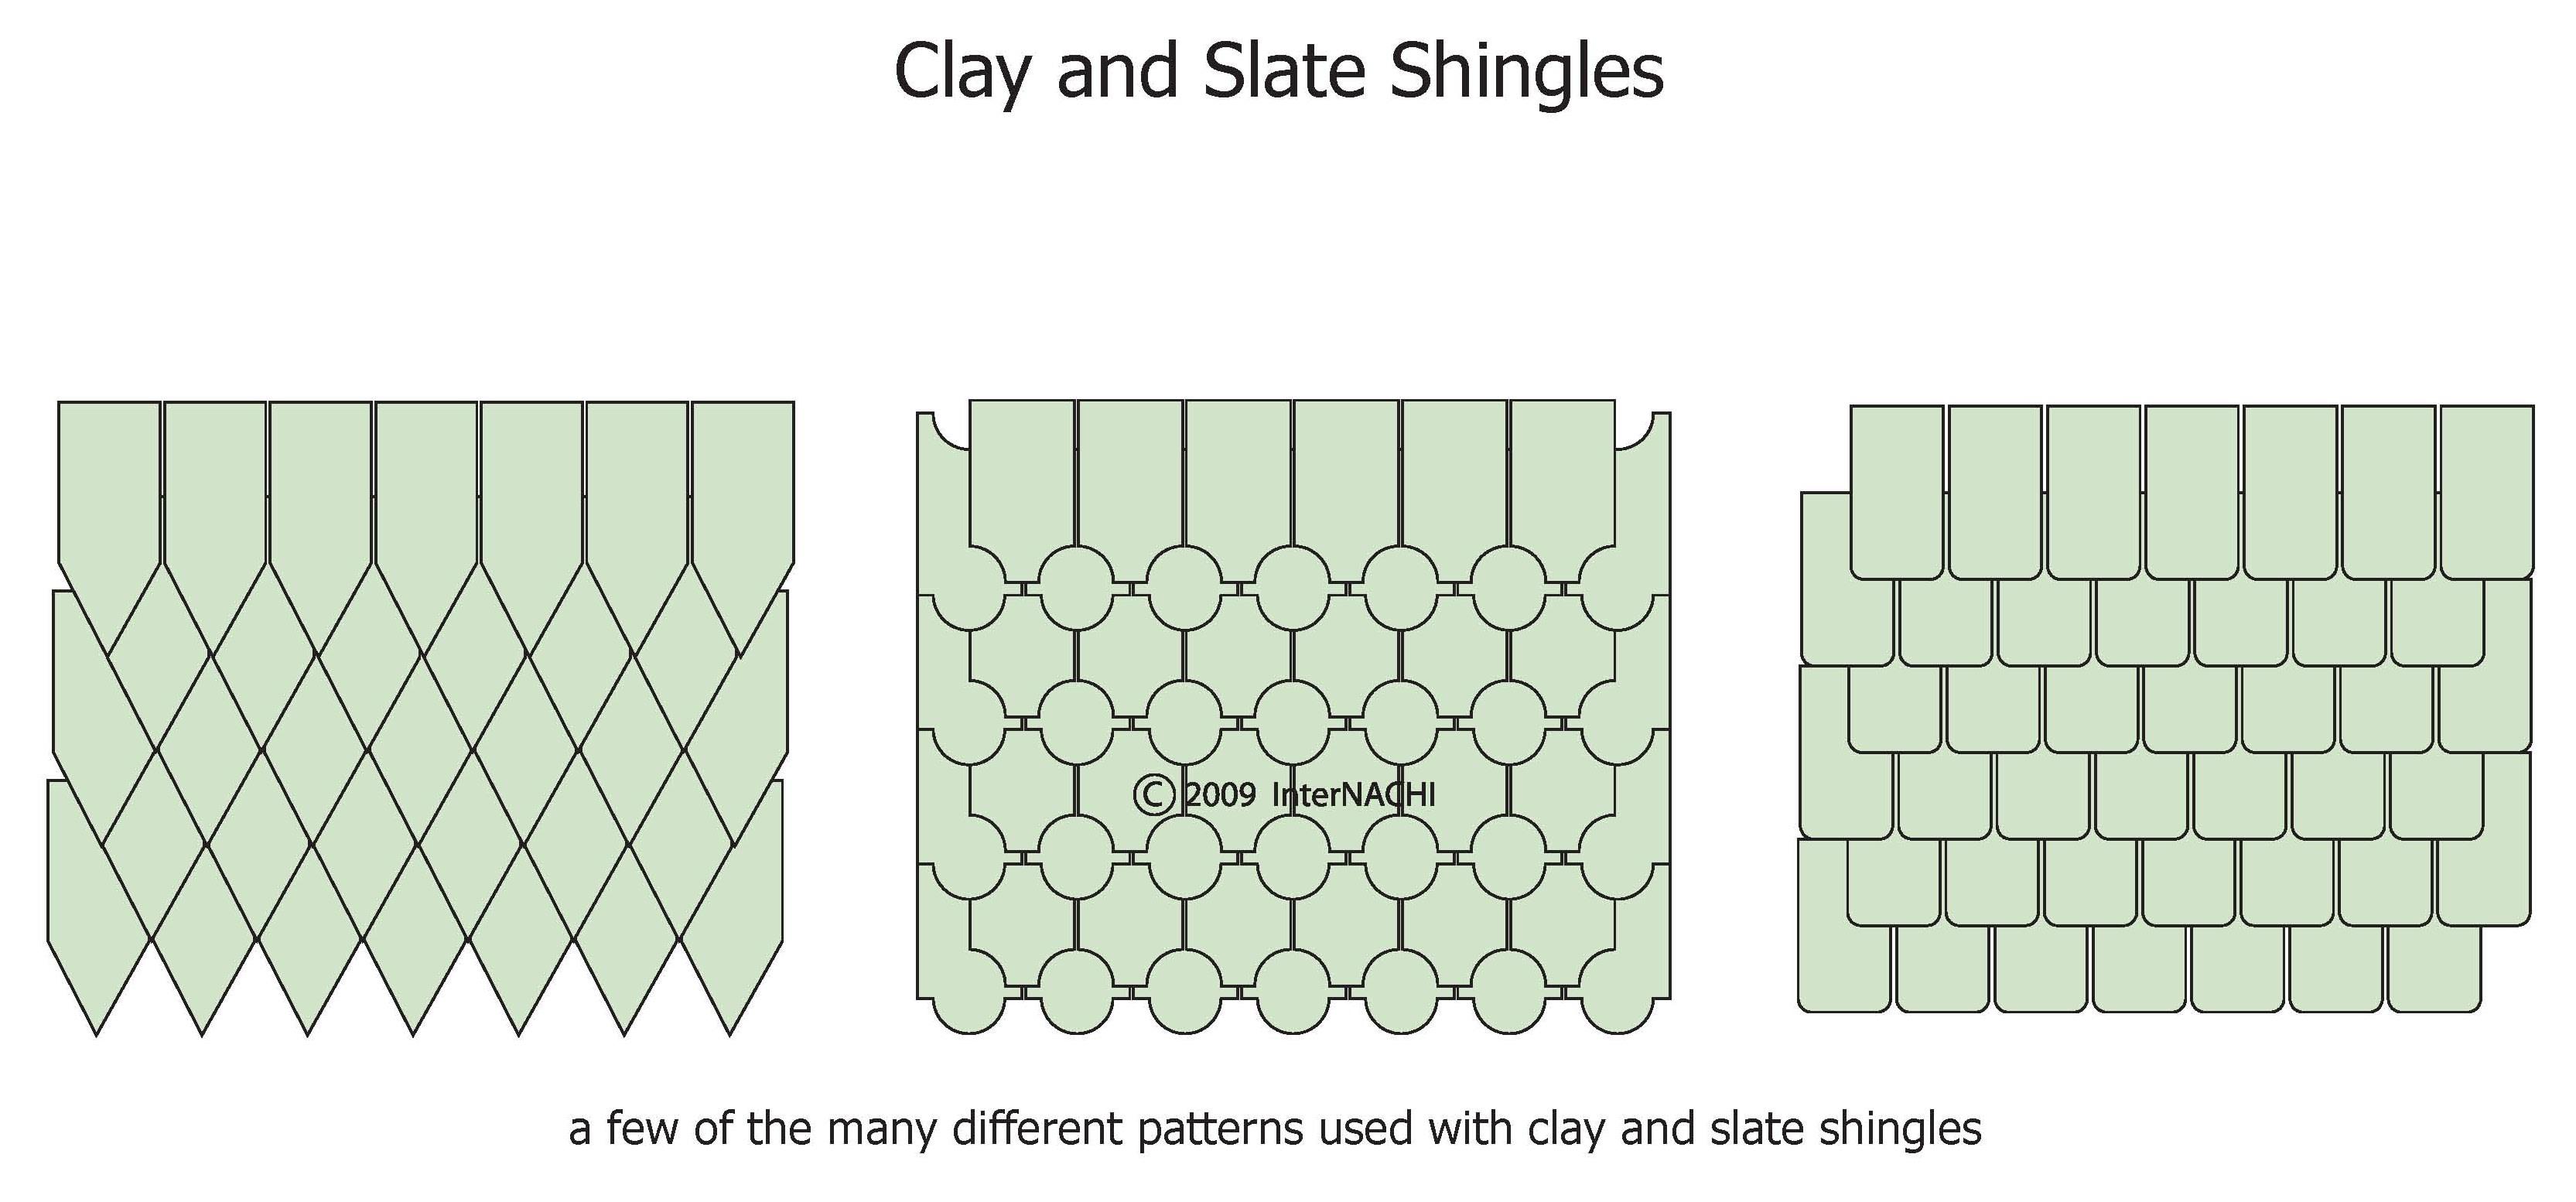 Clay and slate shingles.